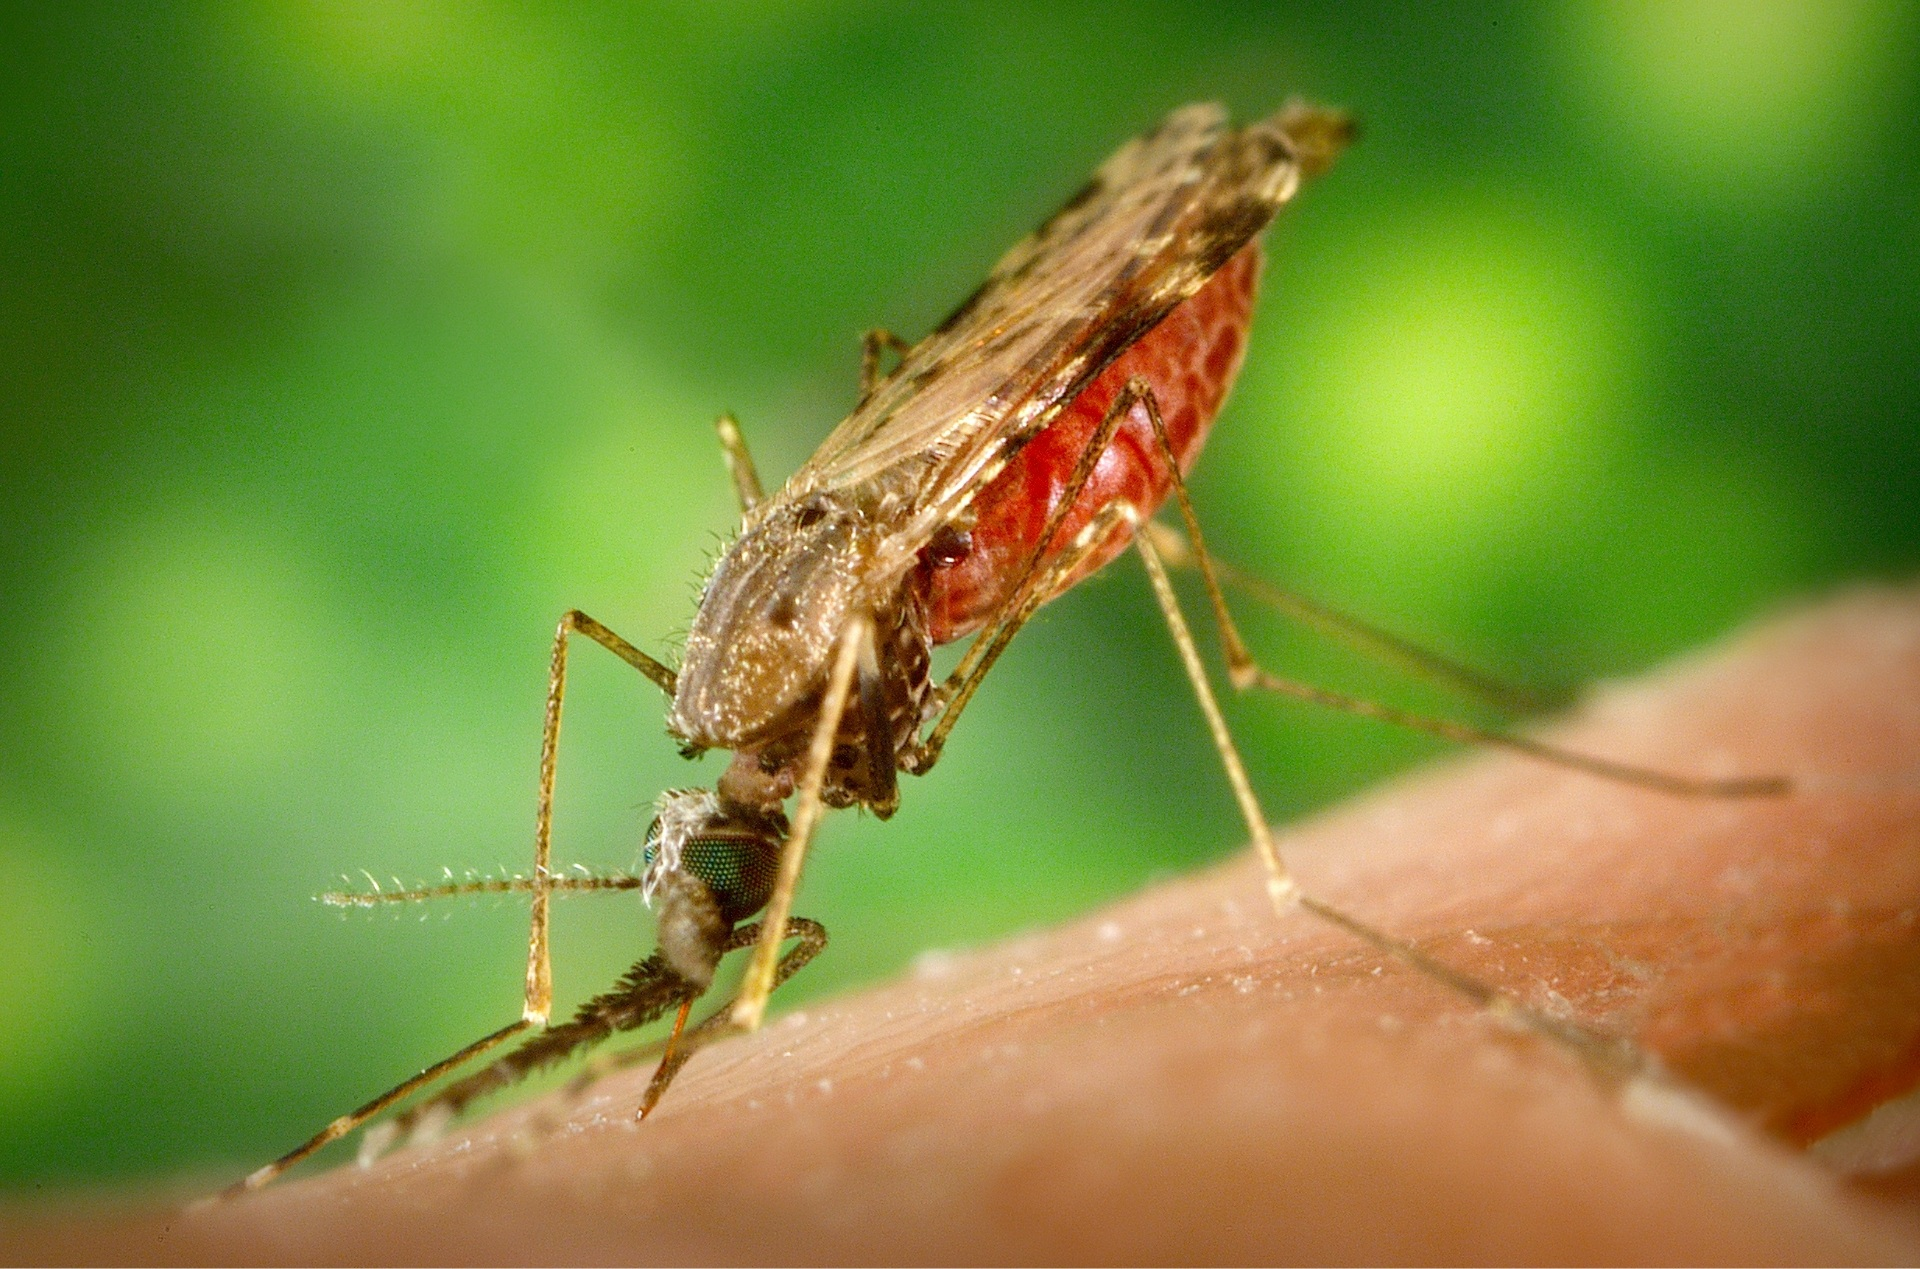 Mosquito Bite, Animal, Bite, Biting, Insect, HQ Photo